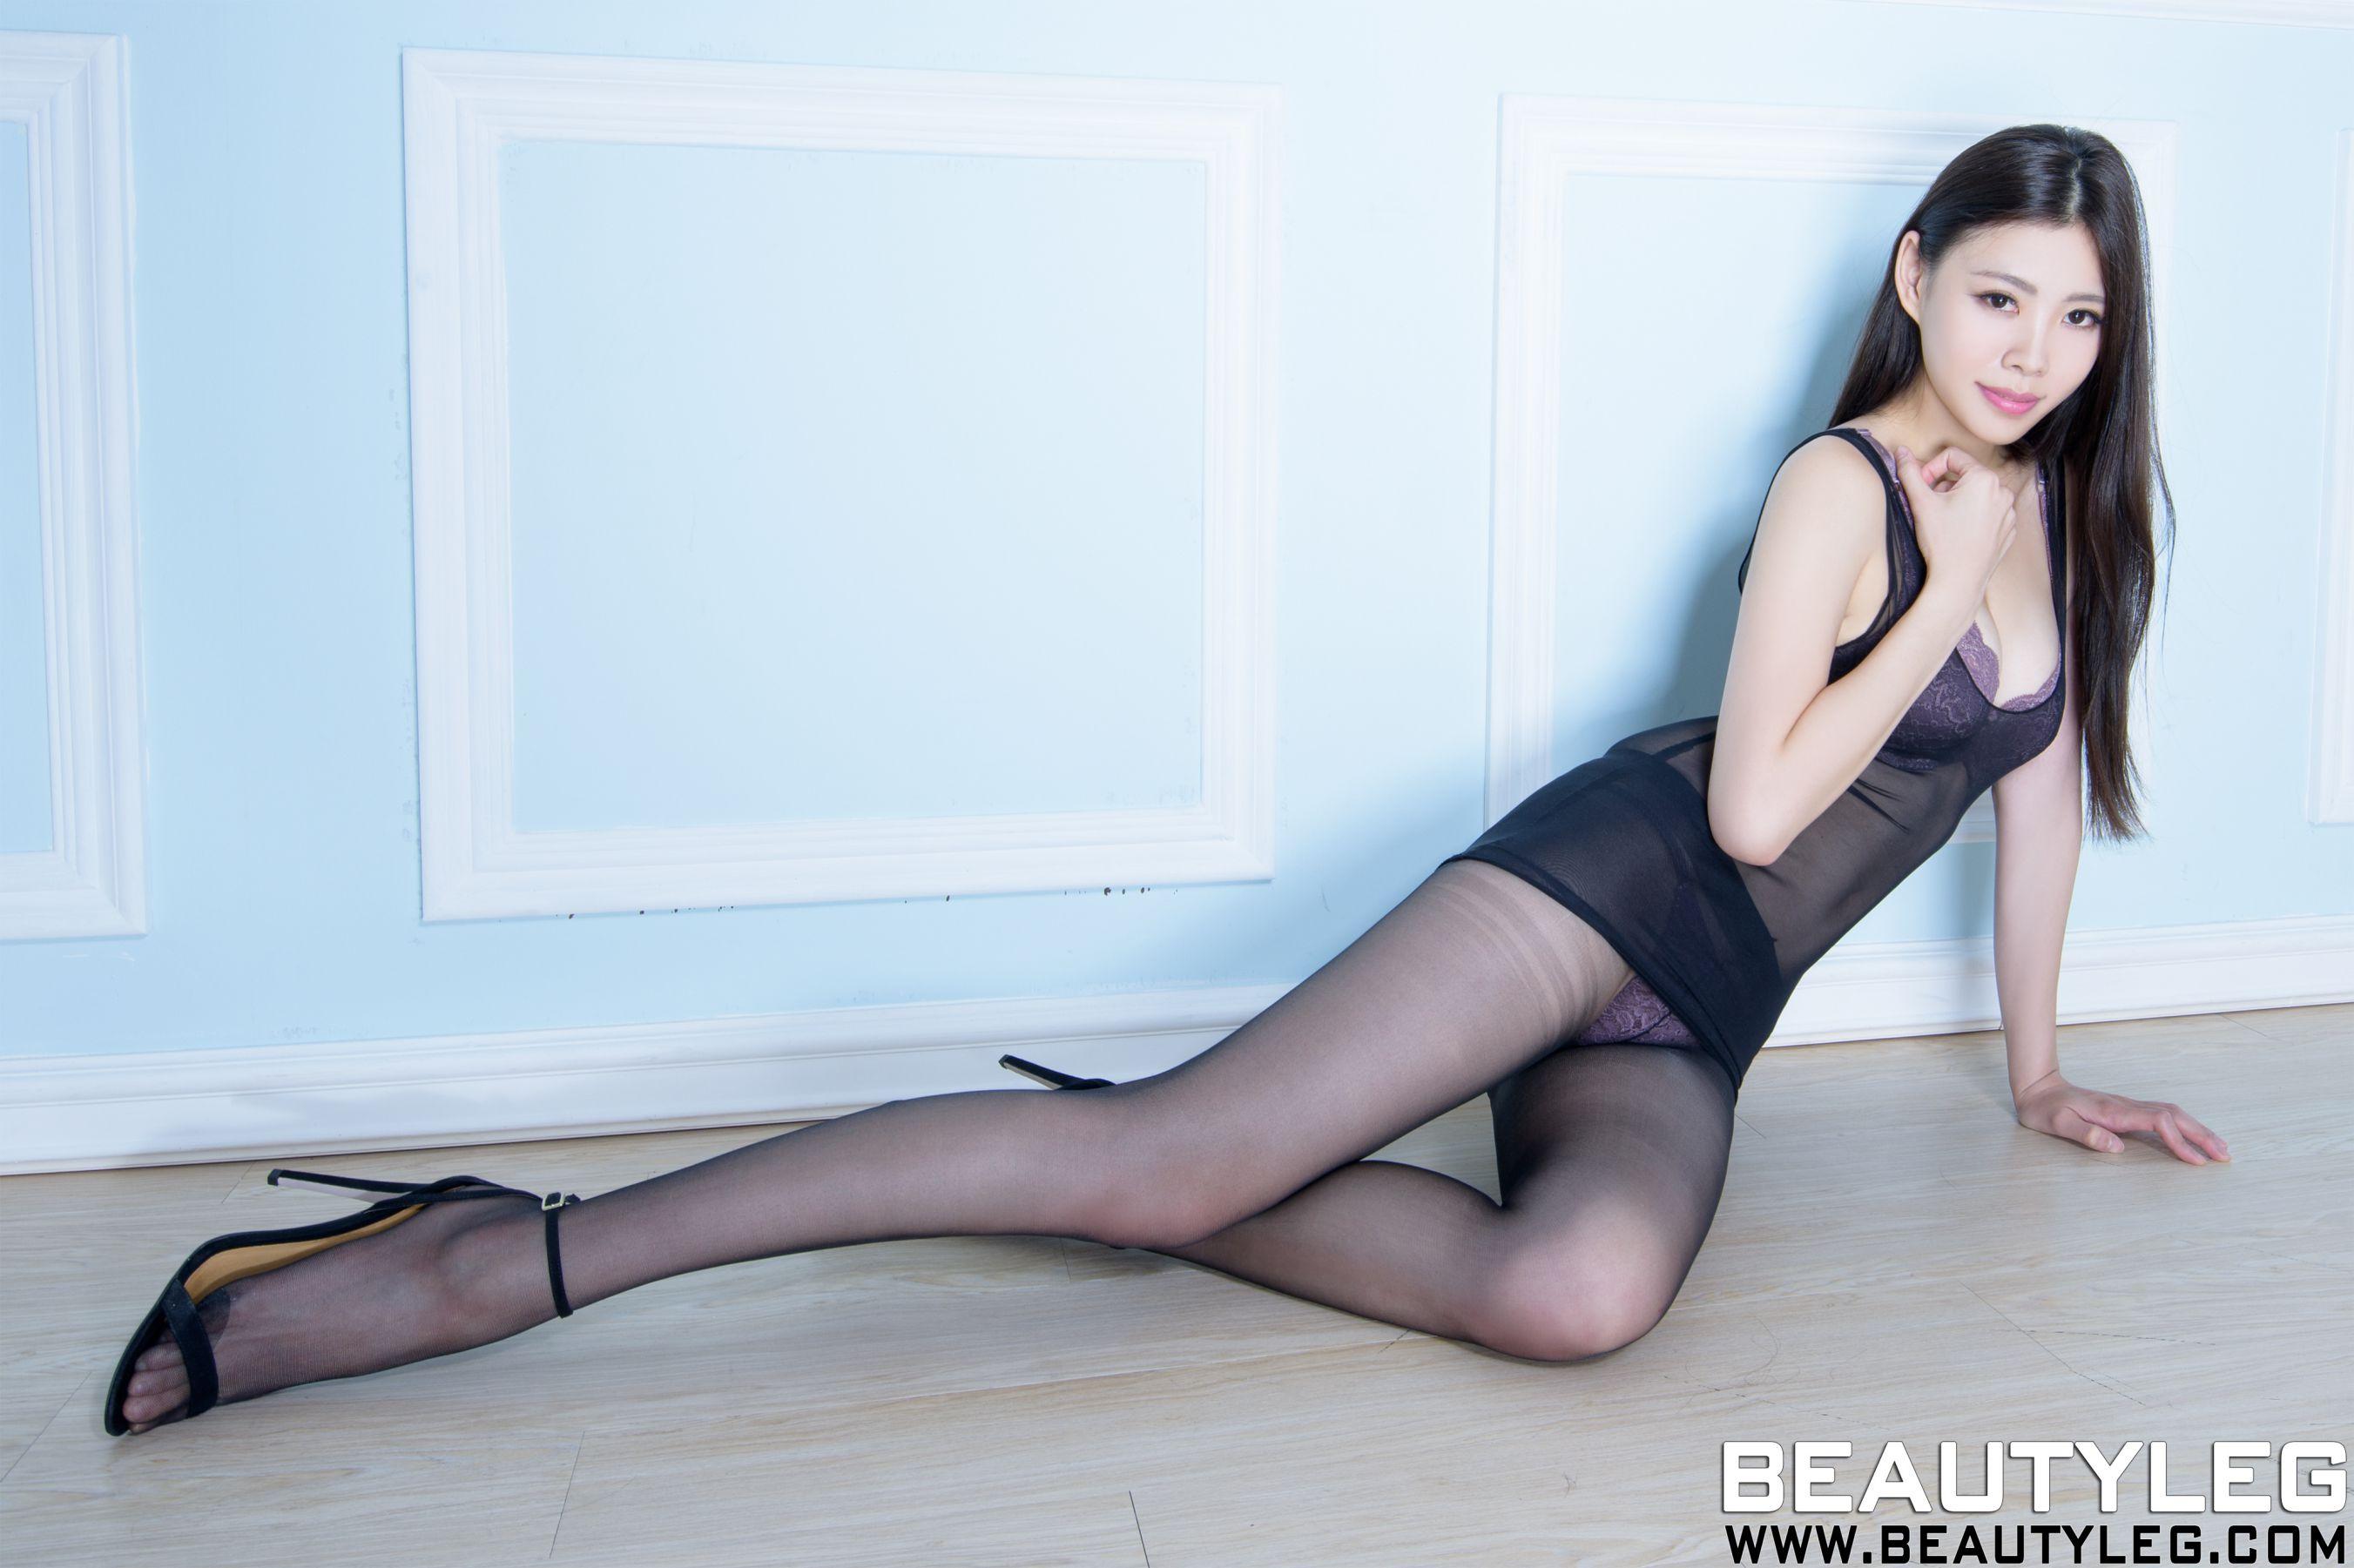 VOL.81 [Beautyleg]内衣美女高跟美腿:腿模Zoey(Zoey)高品质写真套图(47P)